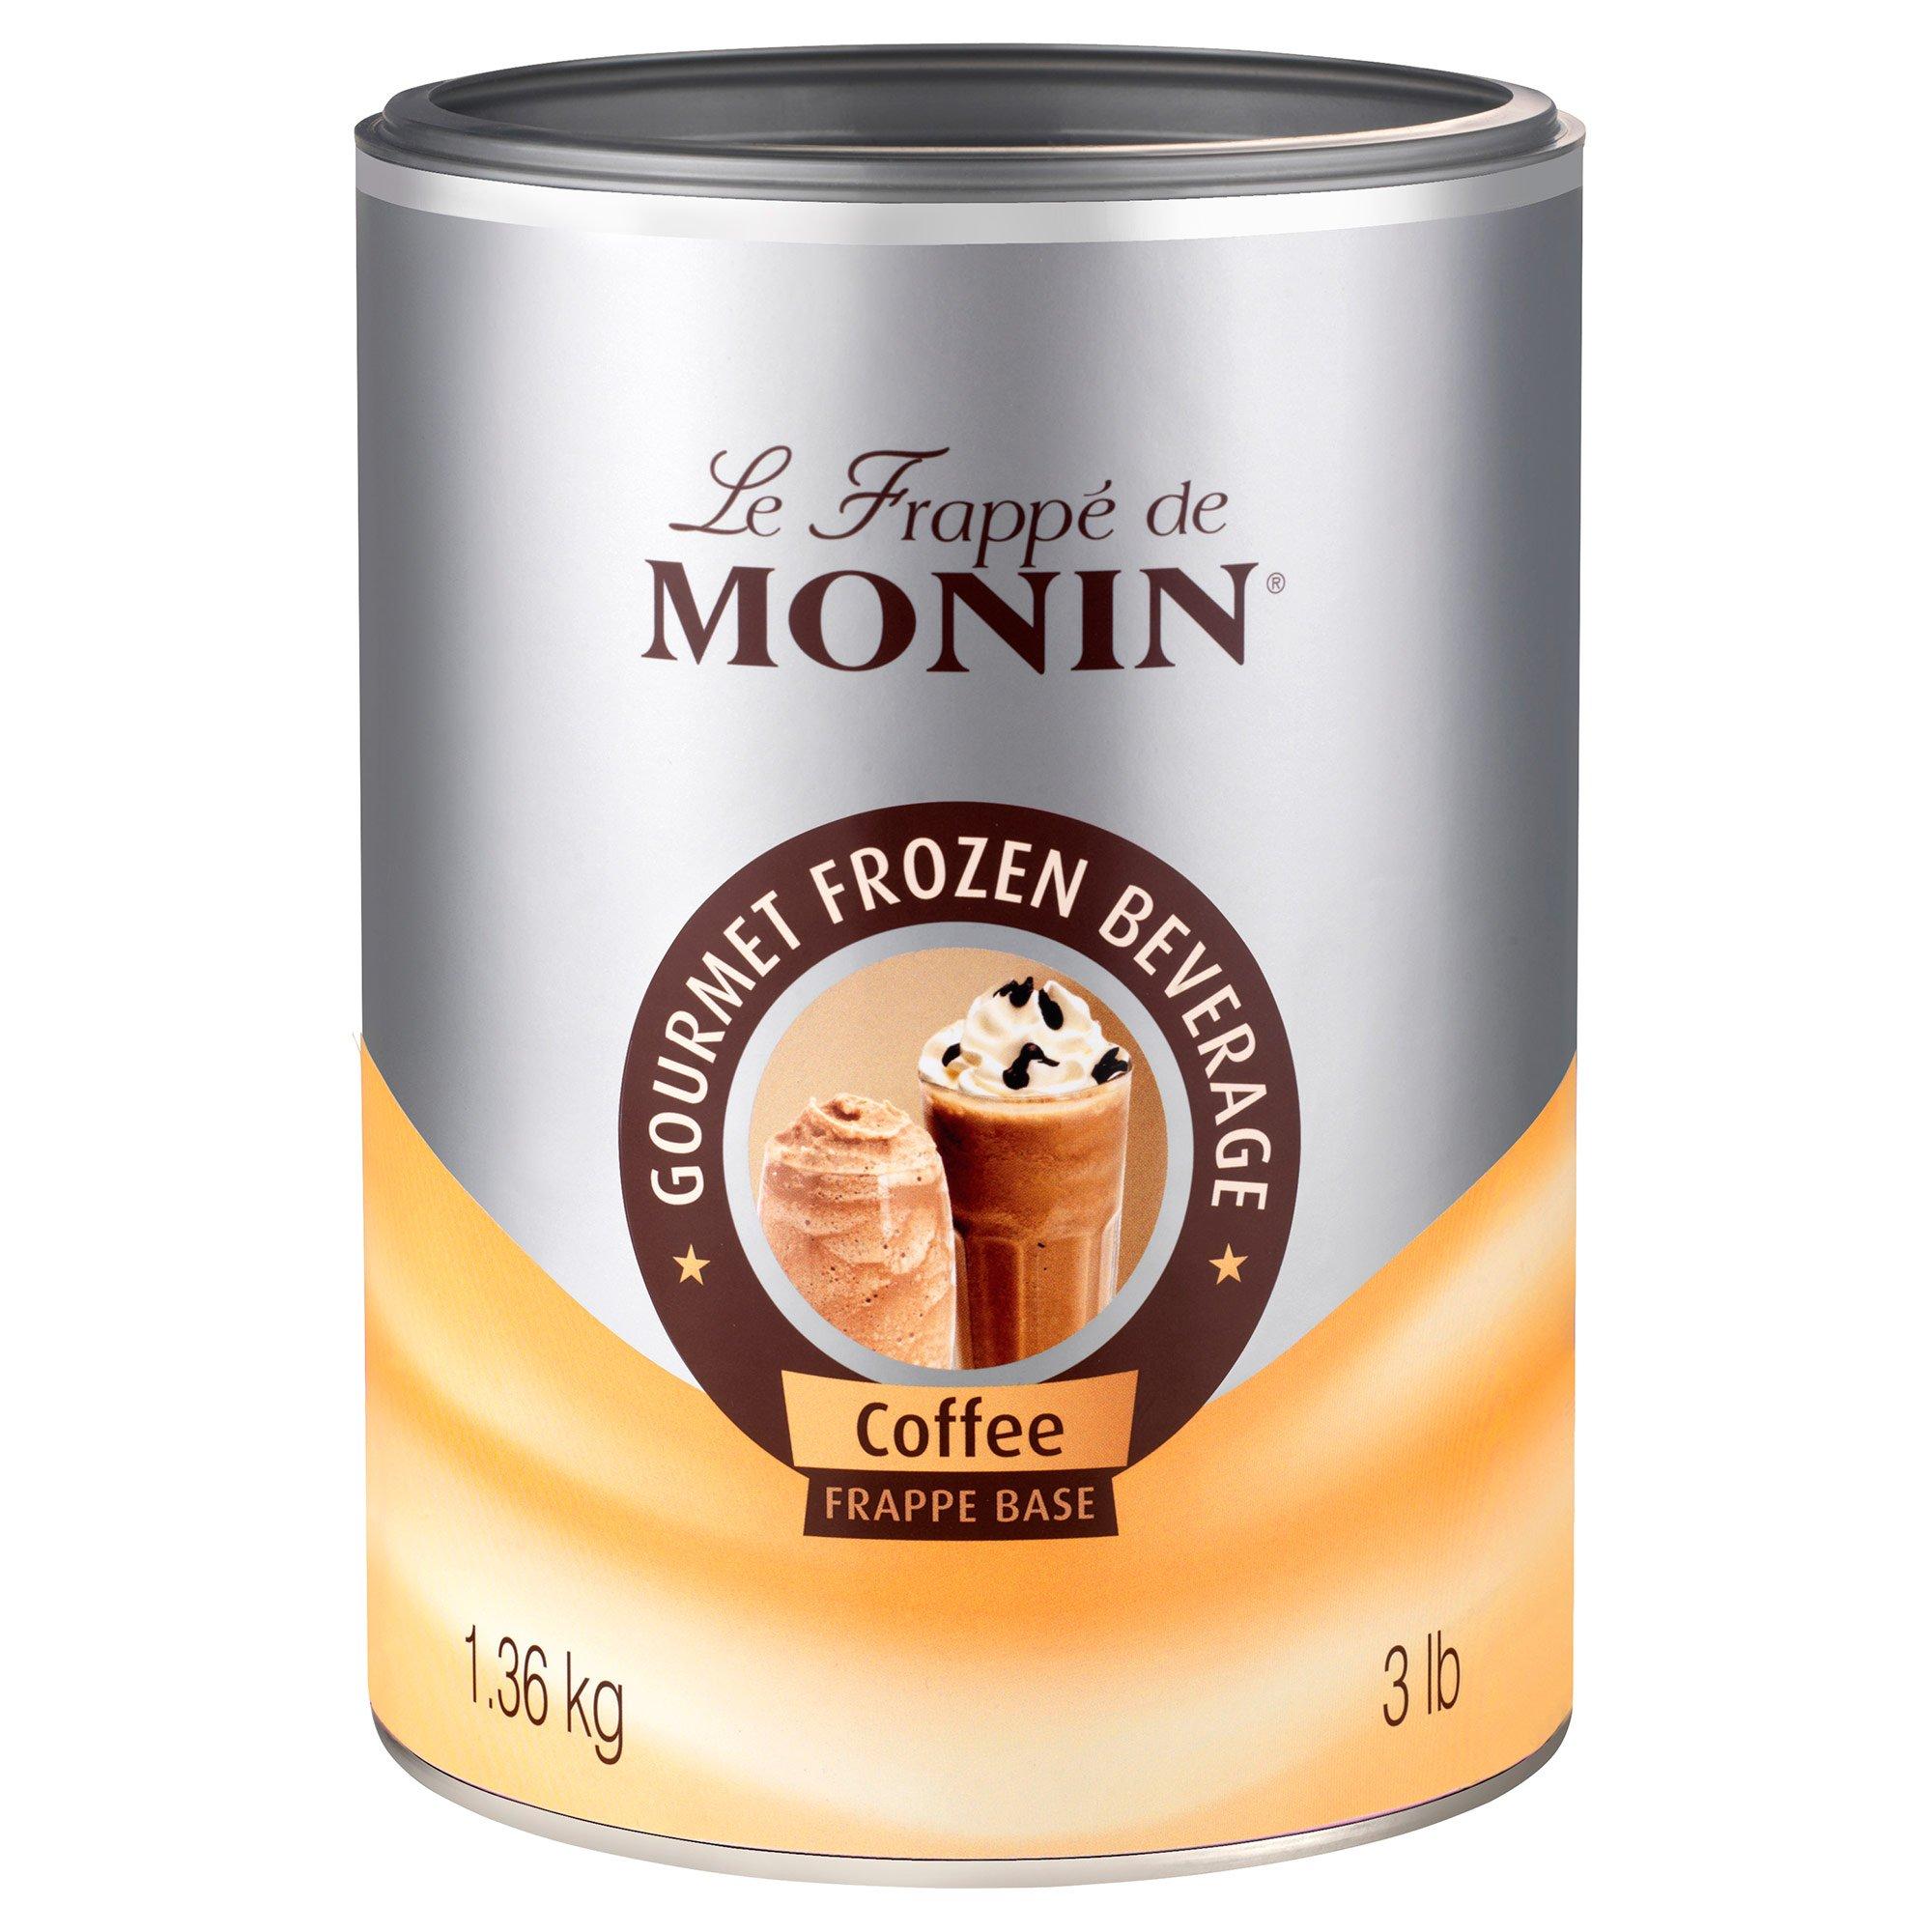 Monin-Coffee-Frappe-Mix-136kg-Tub-Flavour-Powder-for-Coffee-Shops